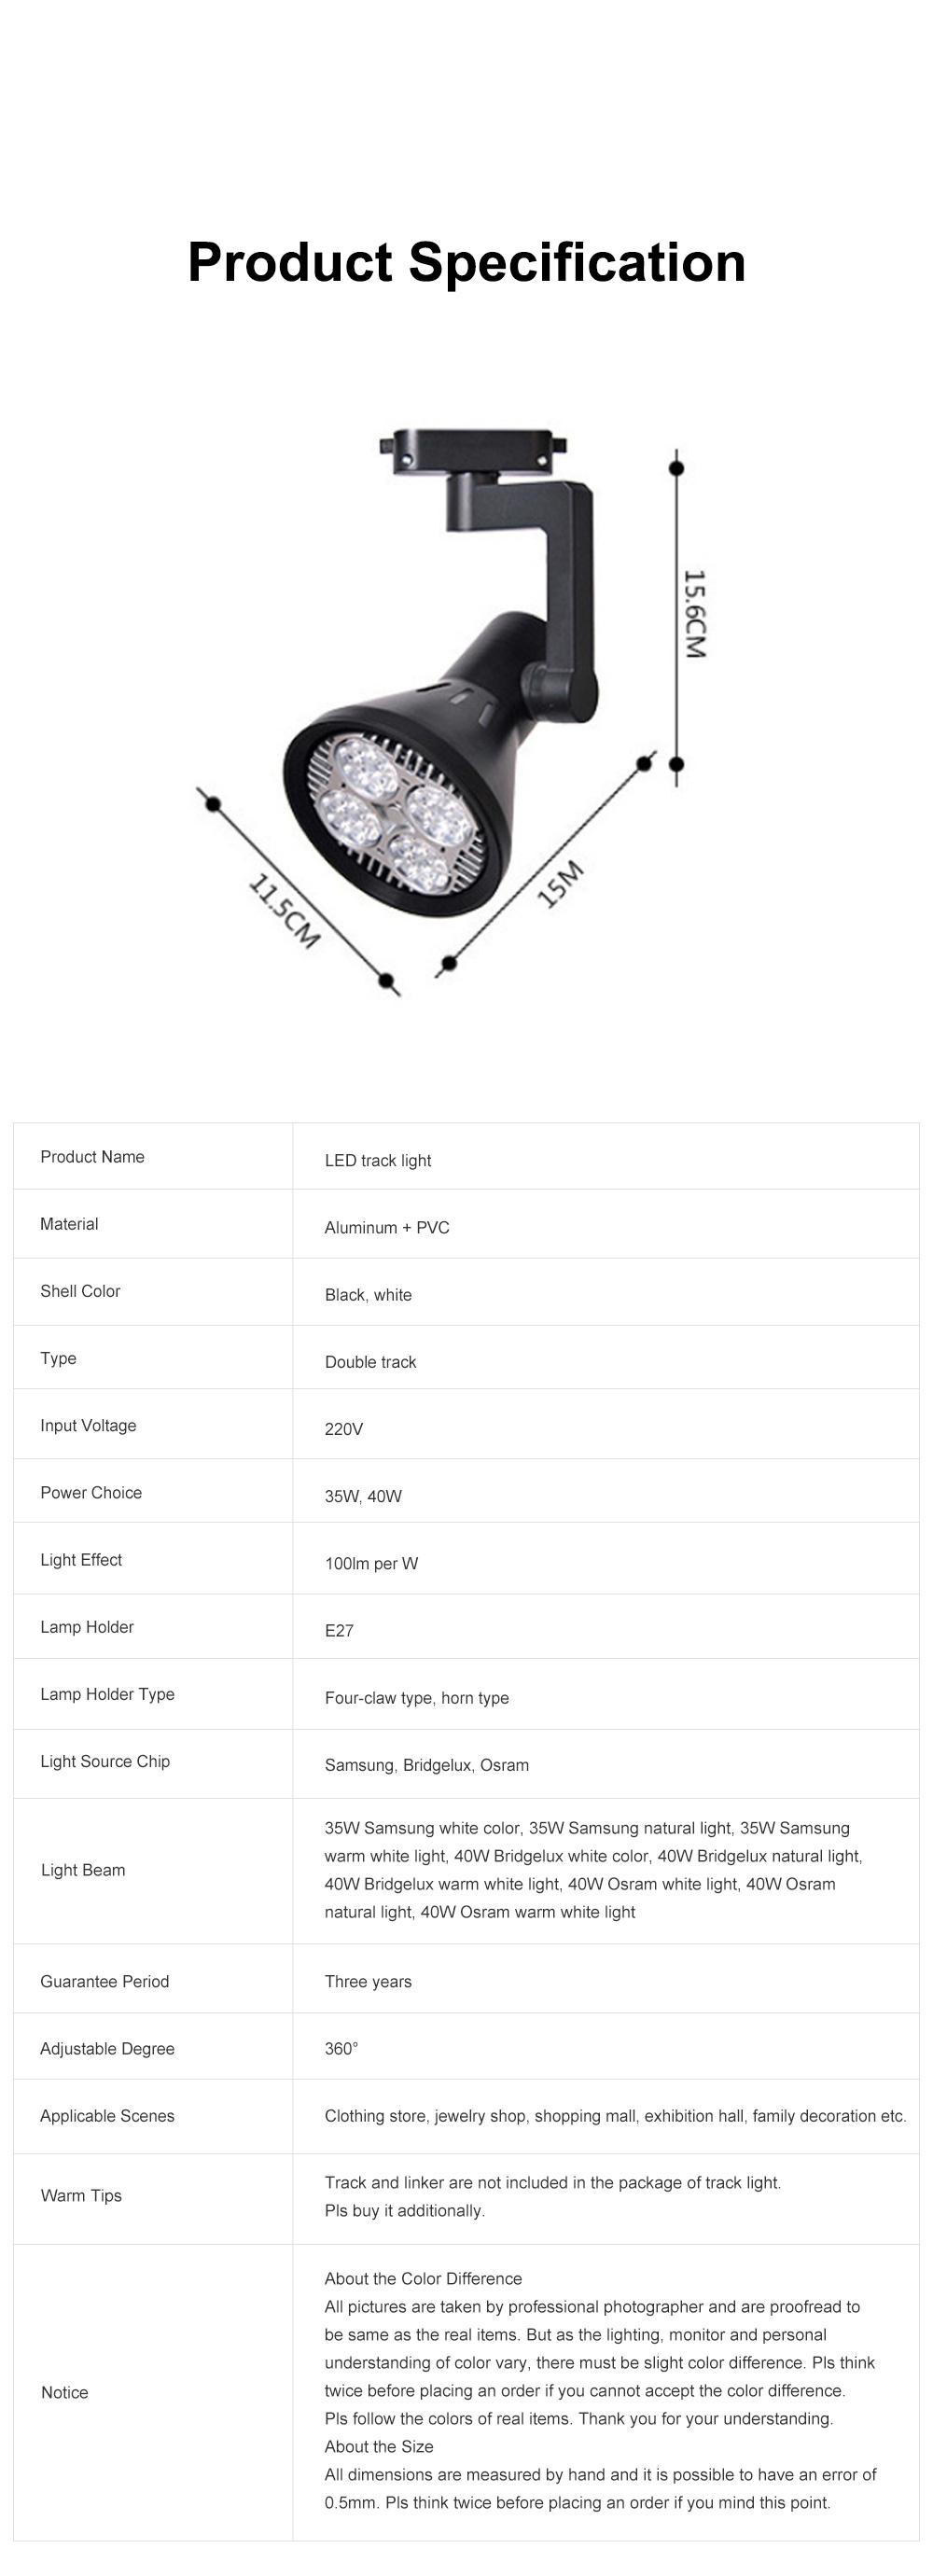 PAR30 Ultra-bright LED Track Lighting for Clothing Store Art Gallery Warm Light LED Track Lamp Free Rotation Lazy Arm Tracking Spotlight 8